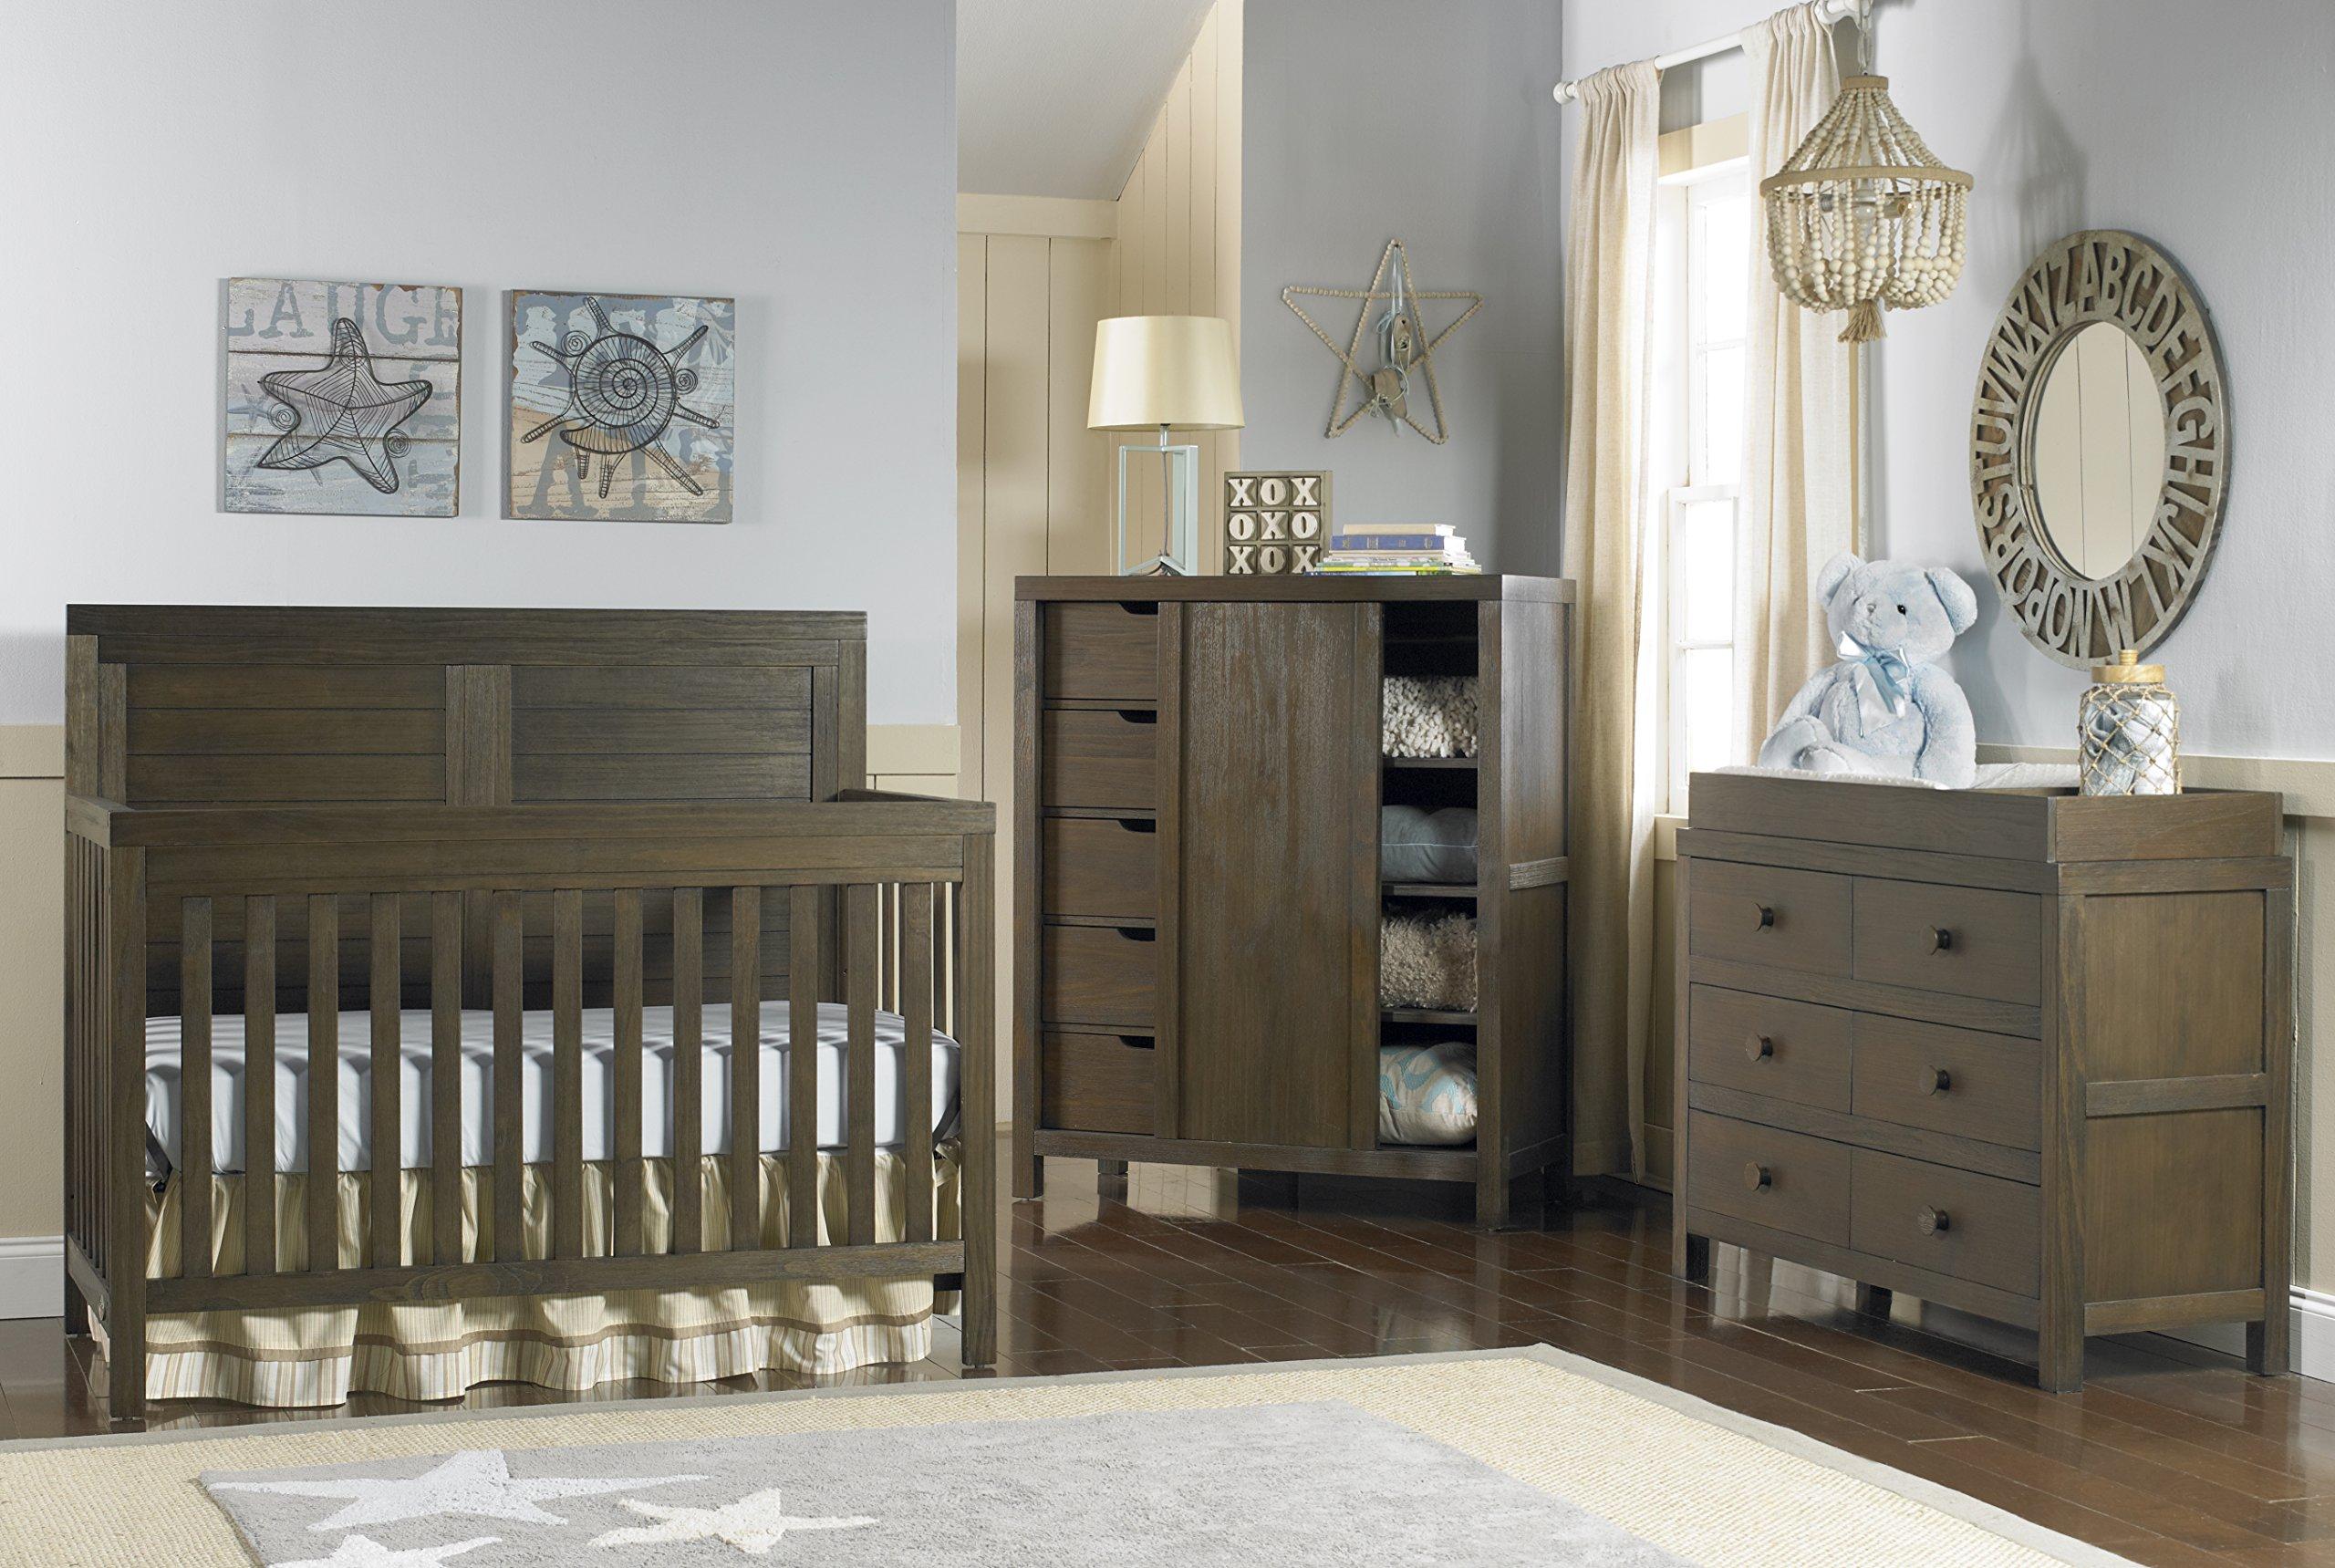 Ti Amo Castello 4 in 1 Convertible Crib, Wire Brushed Brown by Tiamo (Image #2)